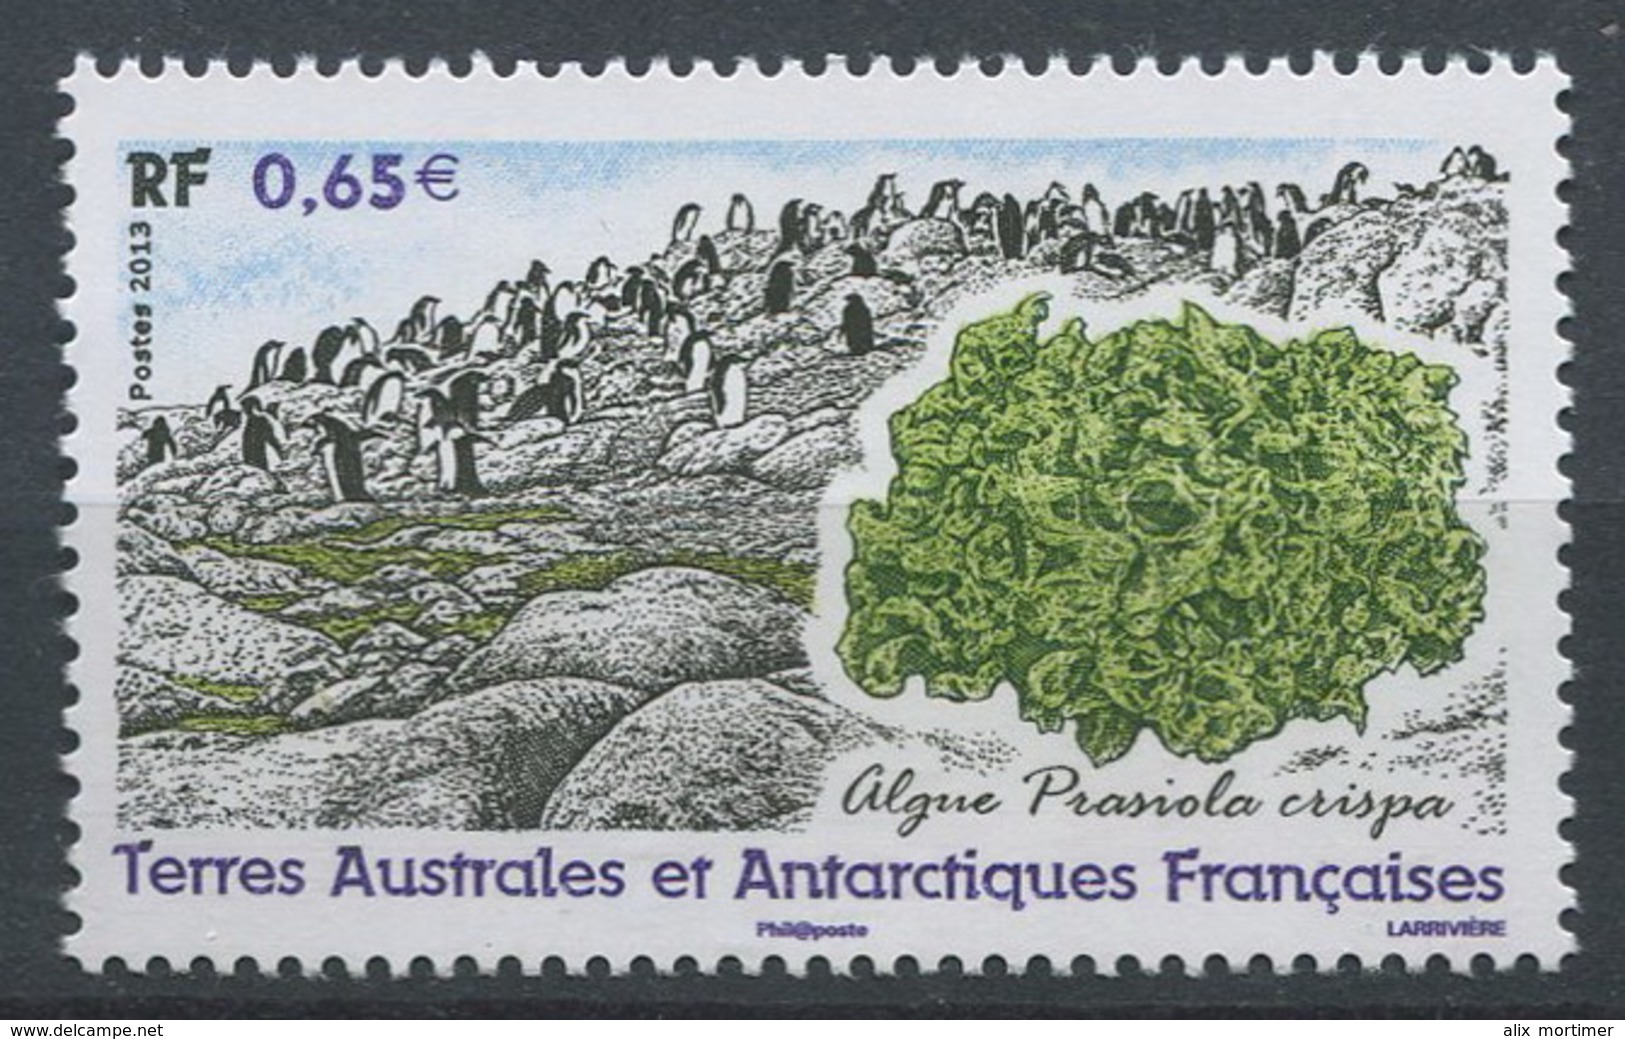 TAAF 2013 - N° 648 - Algue Prasiola Crispa - Neuf -** - Franse Zuidelijke En Antarctische Gebieden (TAAF)